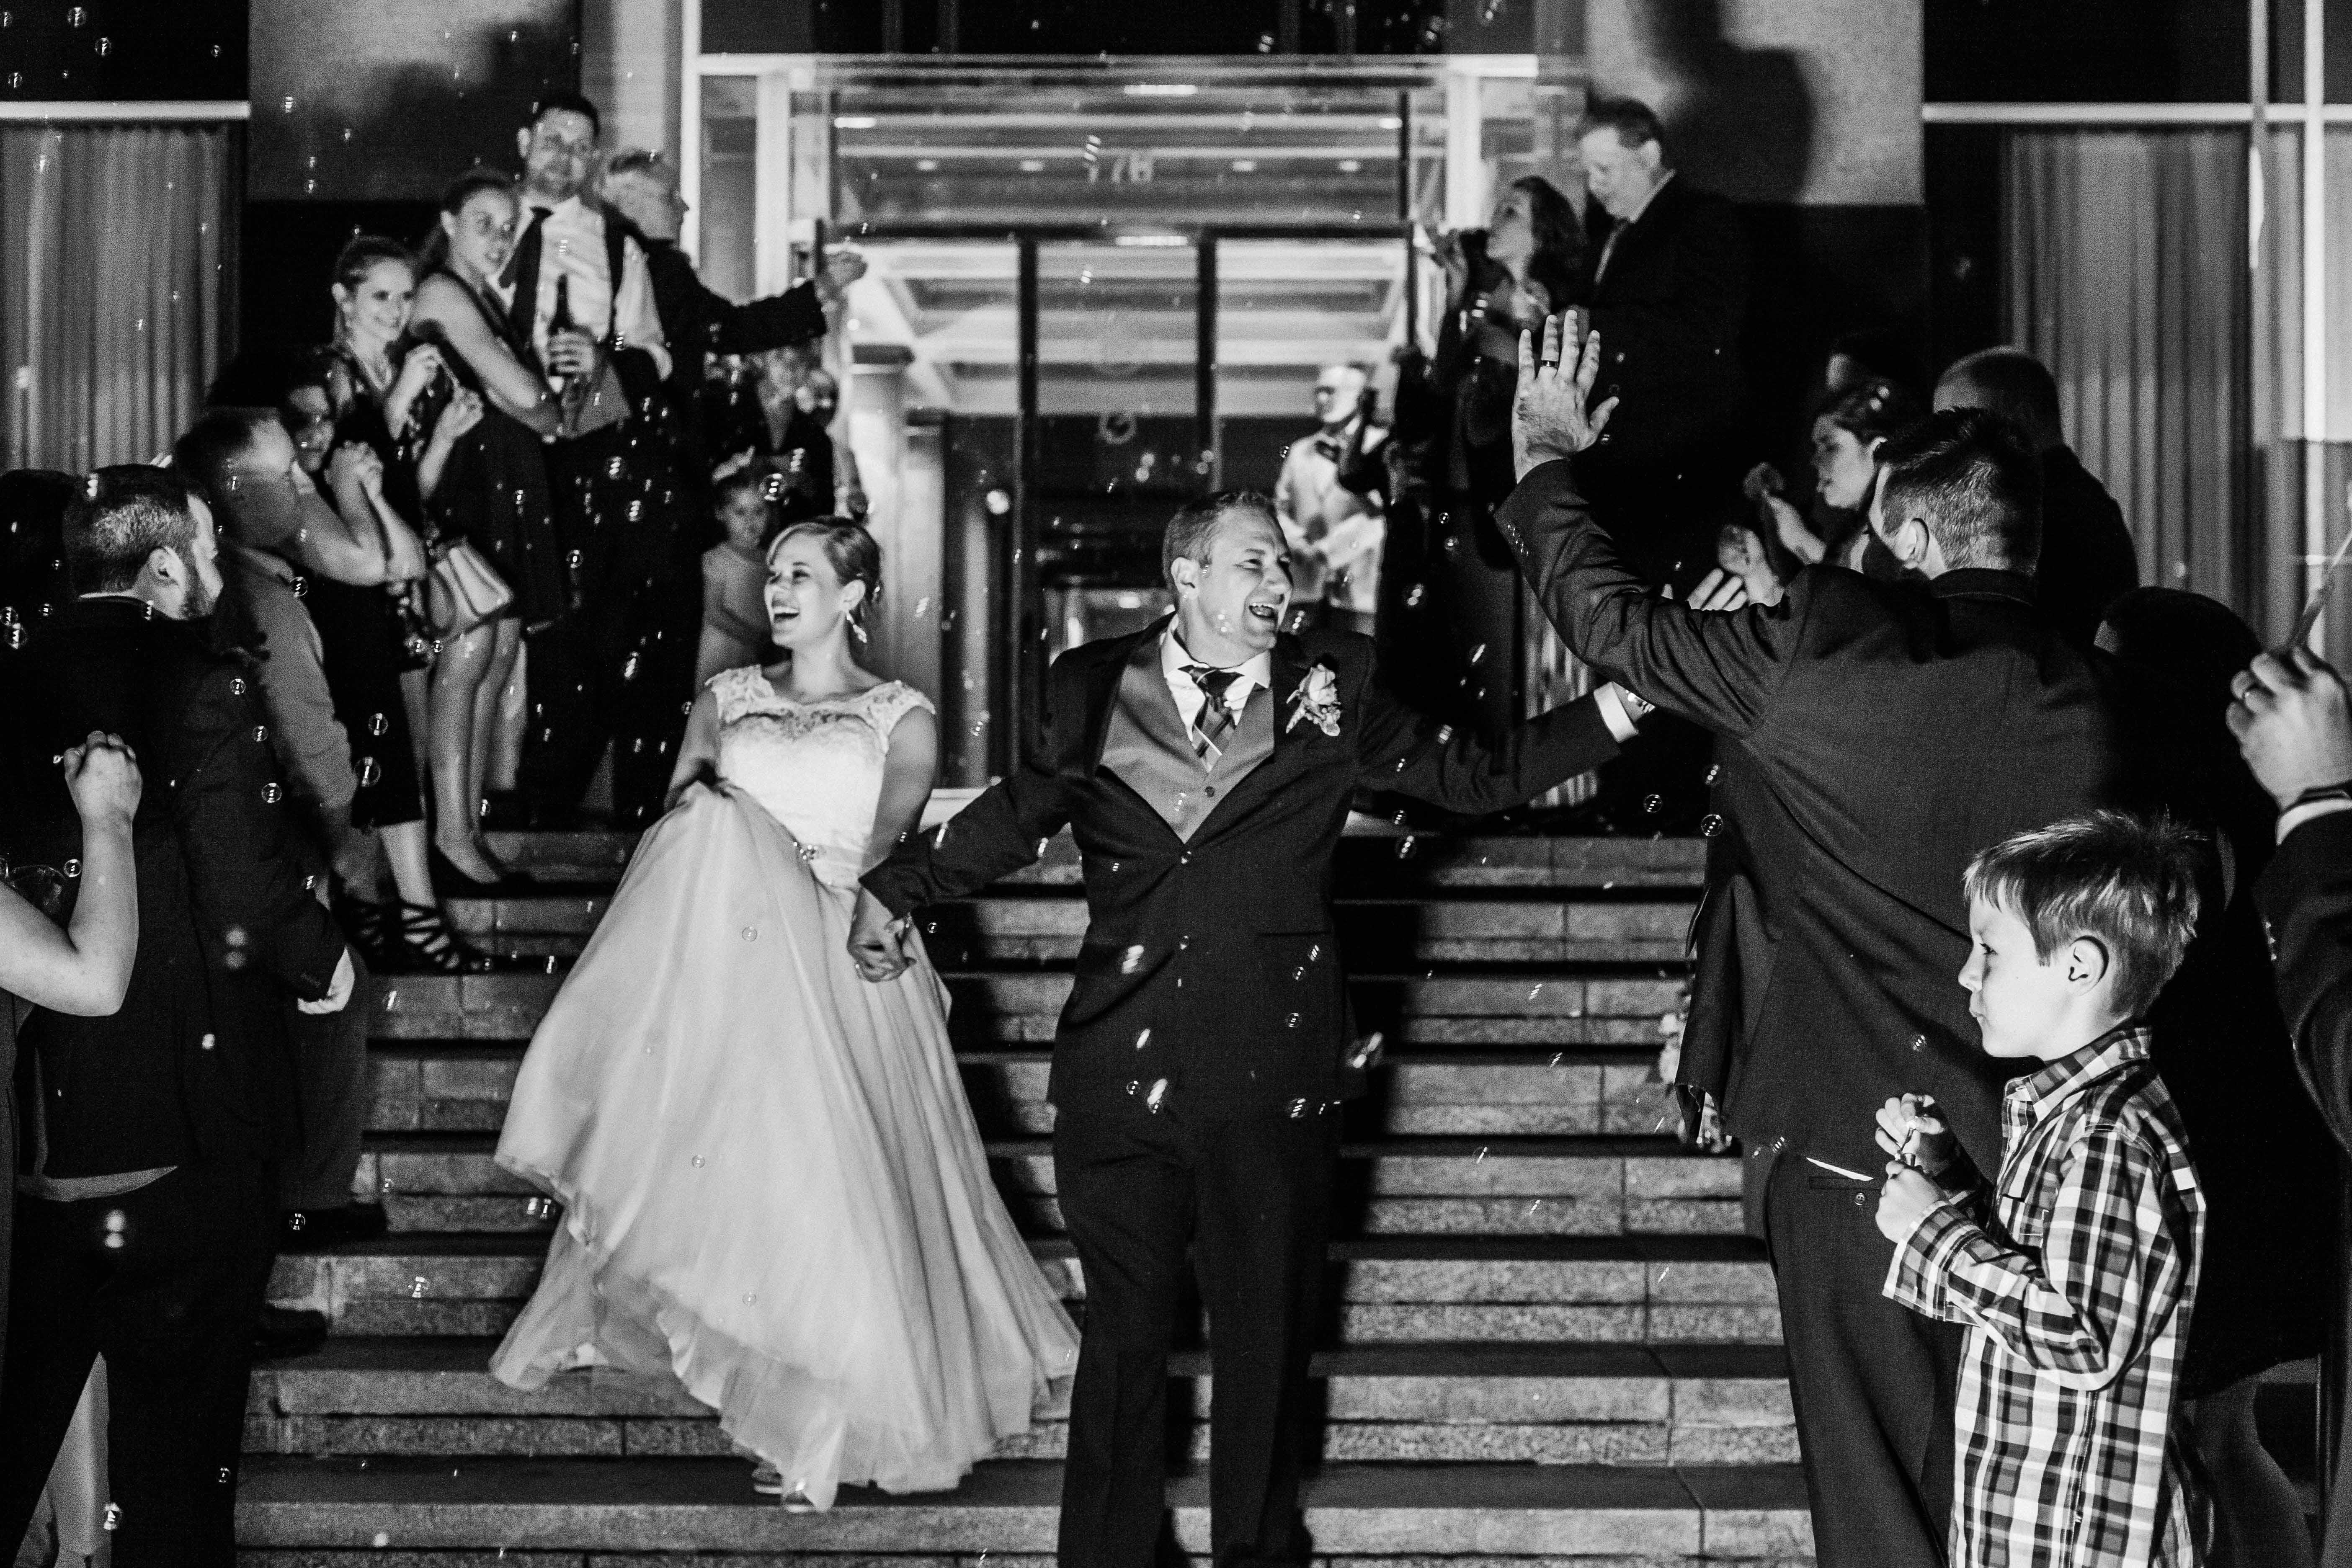 MAULDIN_WEDDING_MONTGOMERY_ALABAMA_WEDDING_PHOTOGRAPHY_135